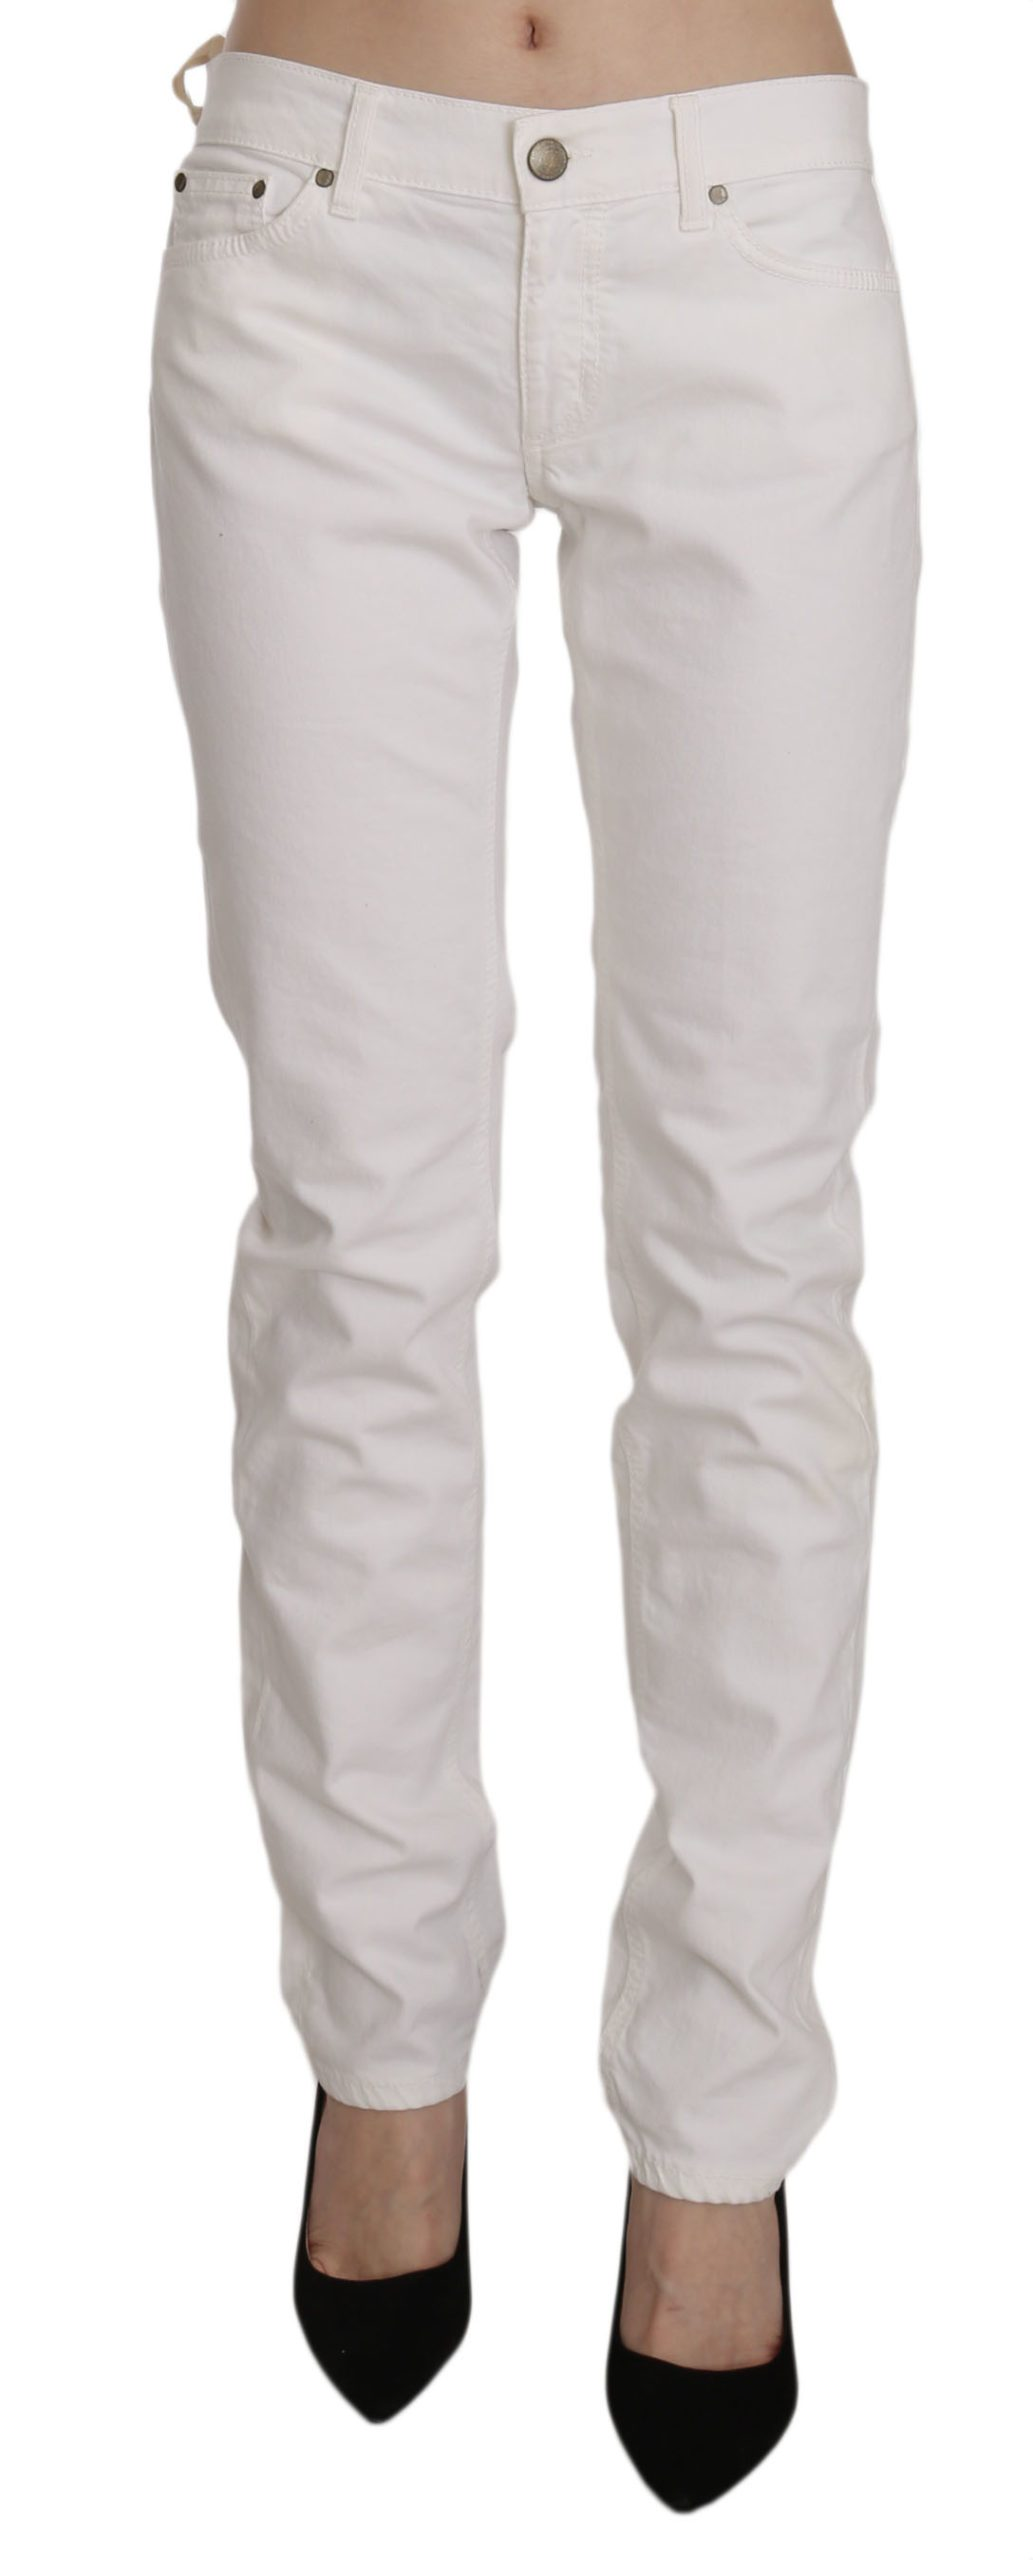 Dondup Women's Cotton Stretch Skinny Casual Denim Trouser White PAN70217 - W31